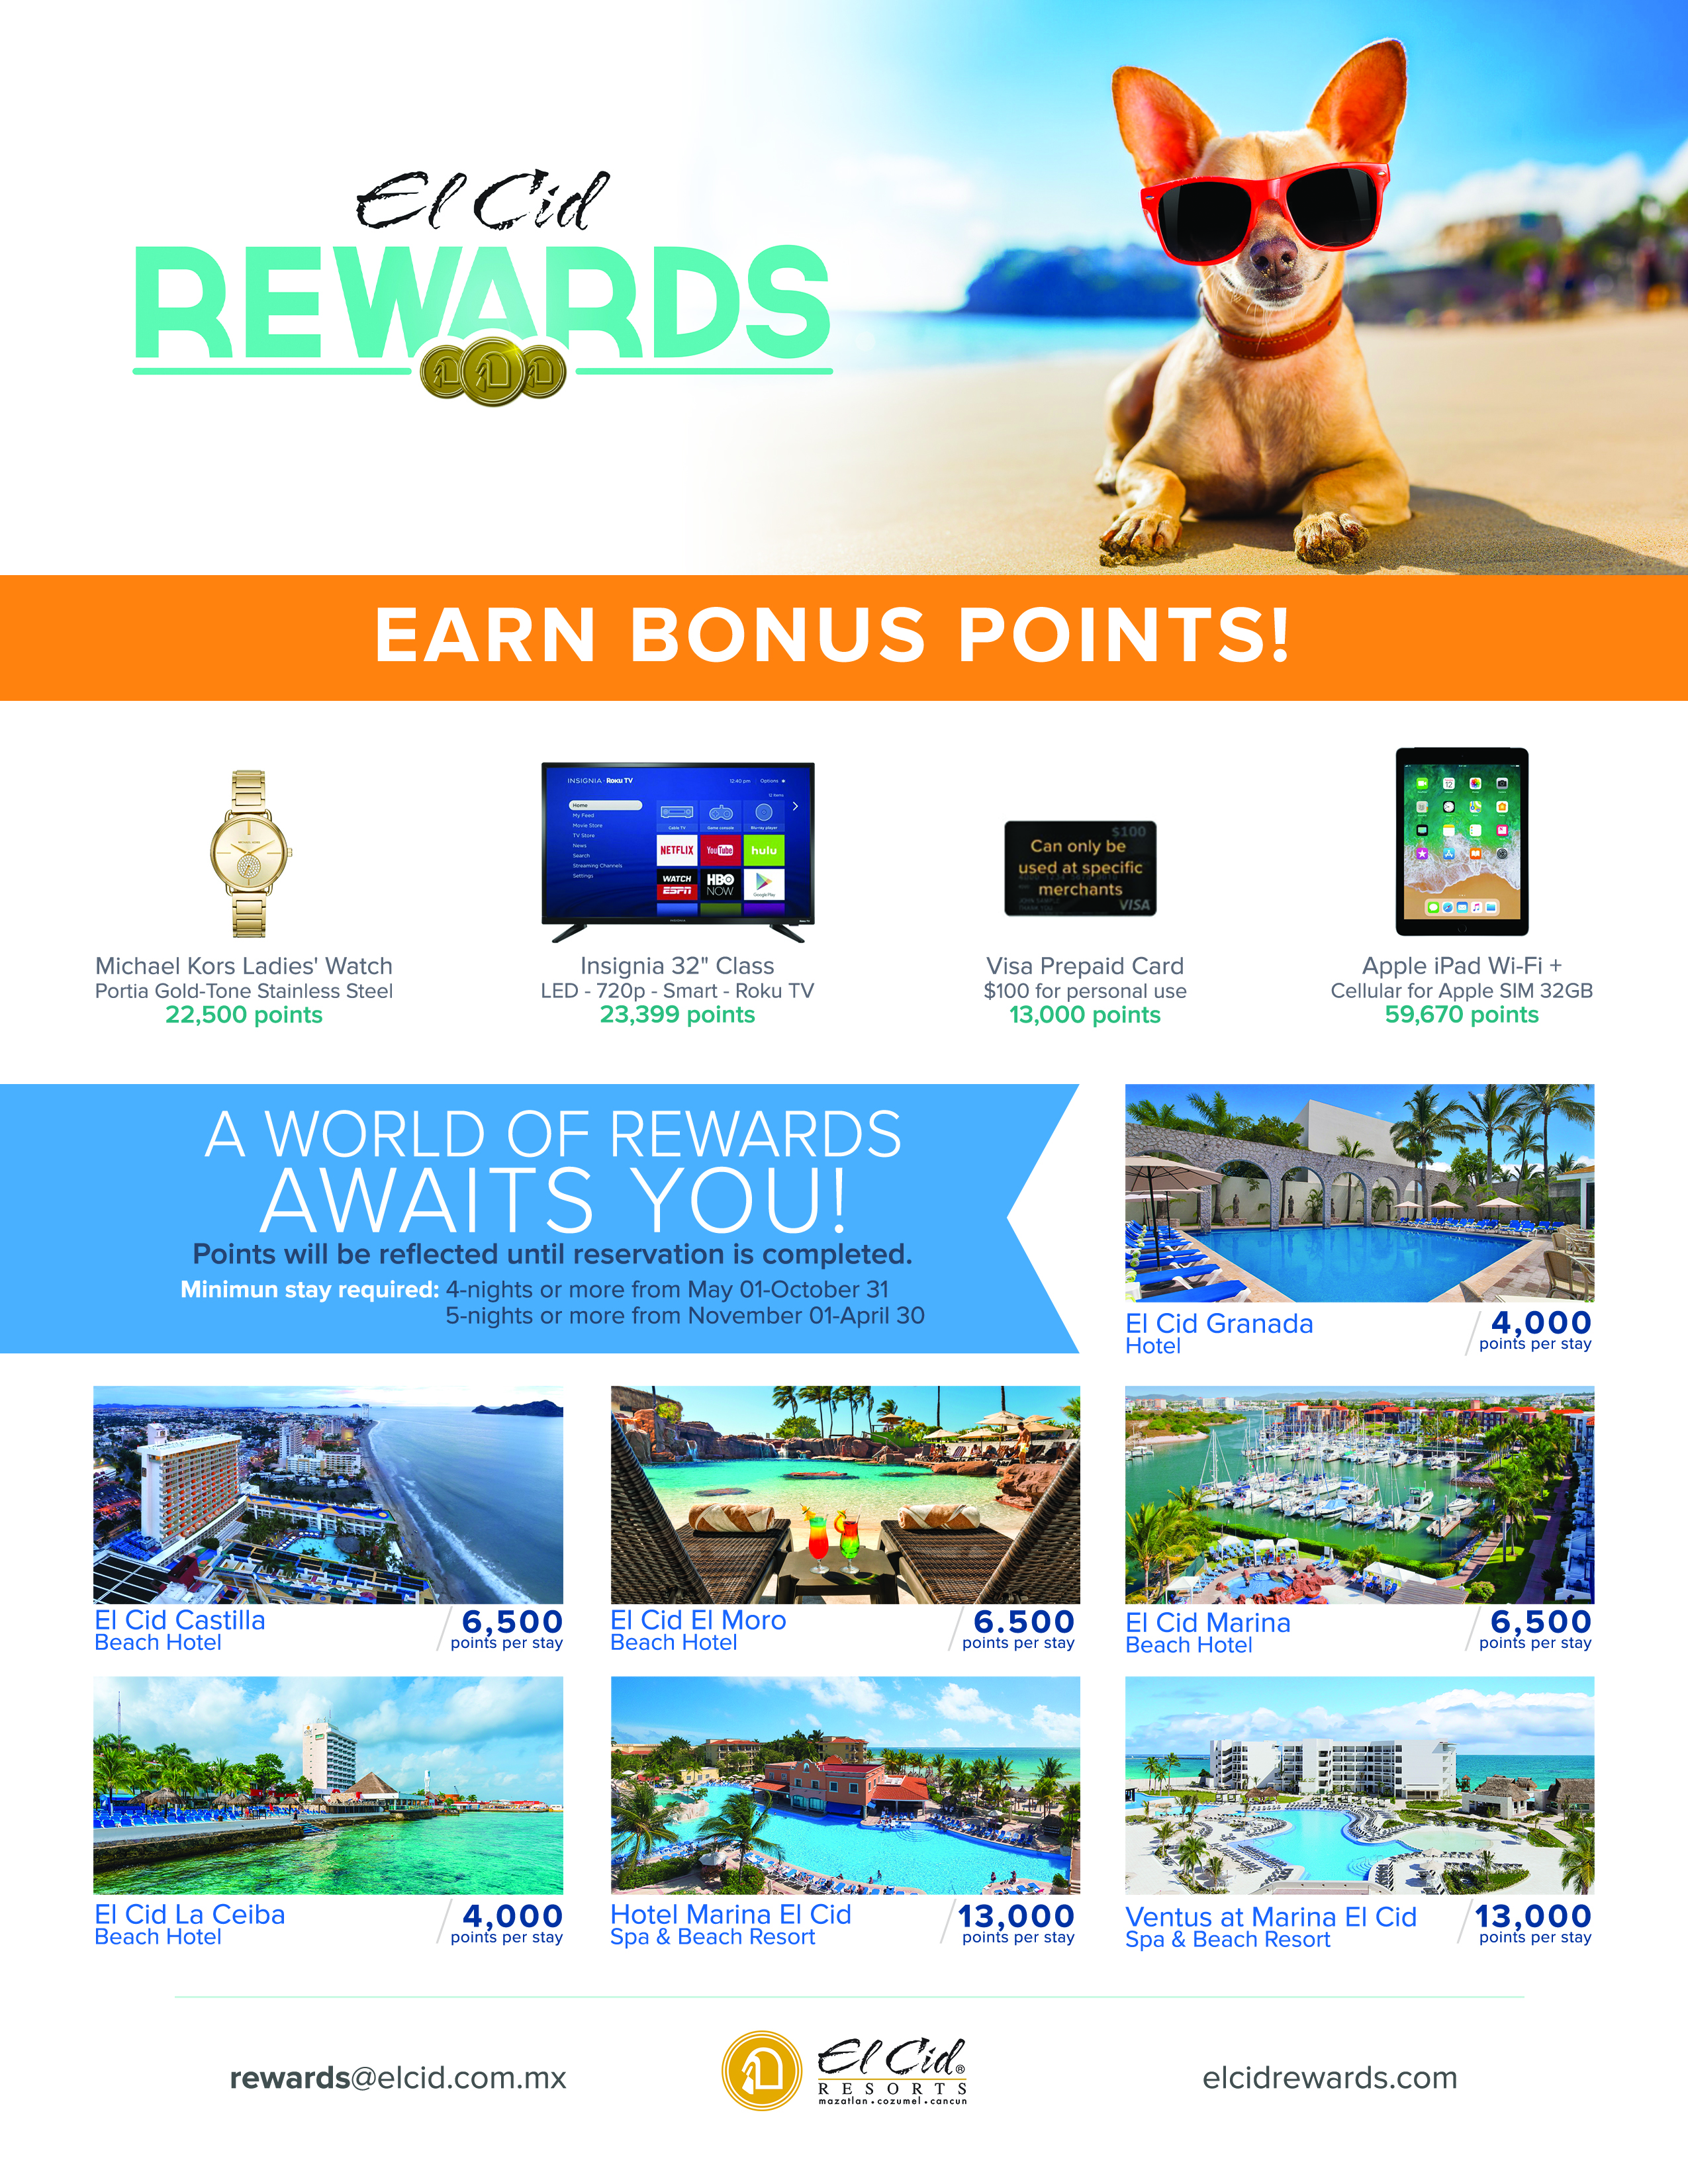 http://www.daemery.com/detm/promotions/ElCid/2020-04-30Earn-Bonus-Points-El%20Cid-Rewards.jpg